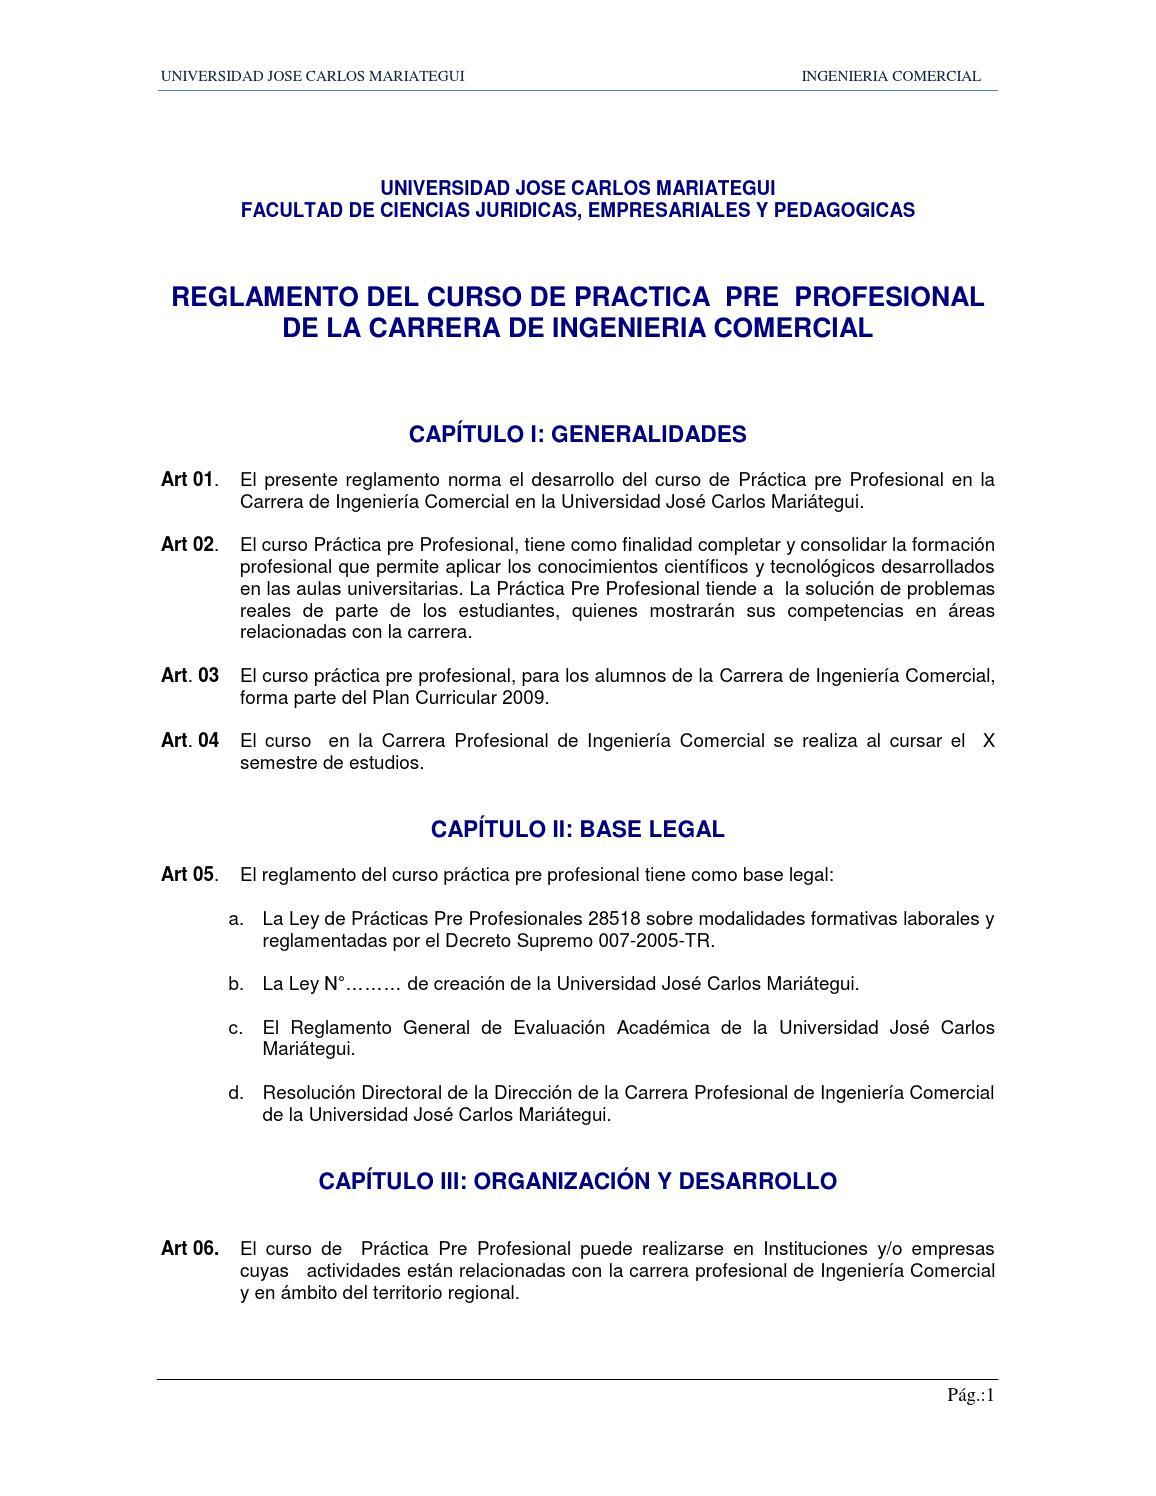 Reglamento practica pre profesional by Gustavo Córdova - issuu